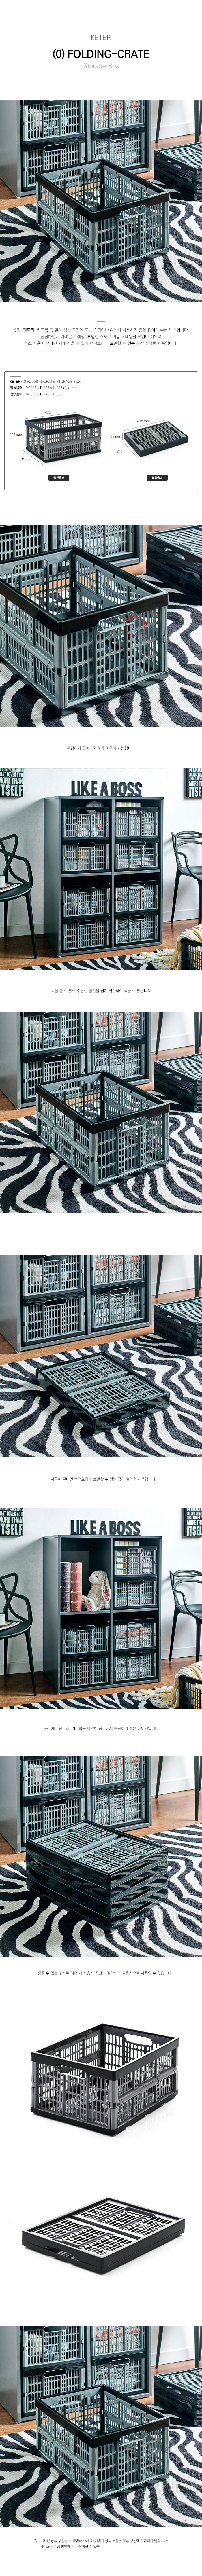 (O)Folding-Crate_Storage_Box_180905.jpg